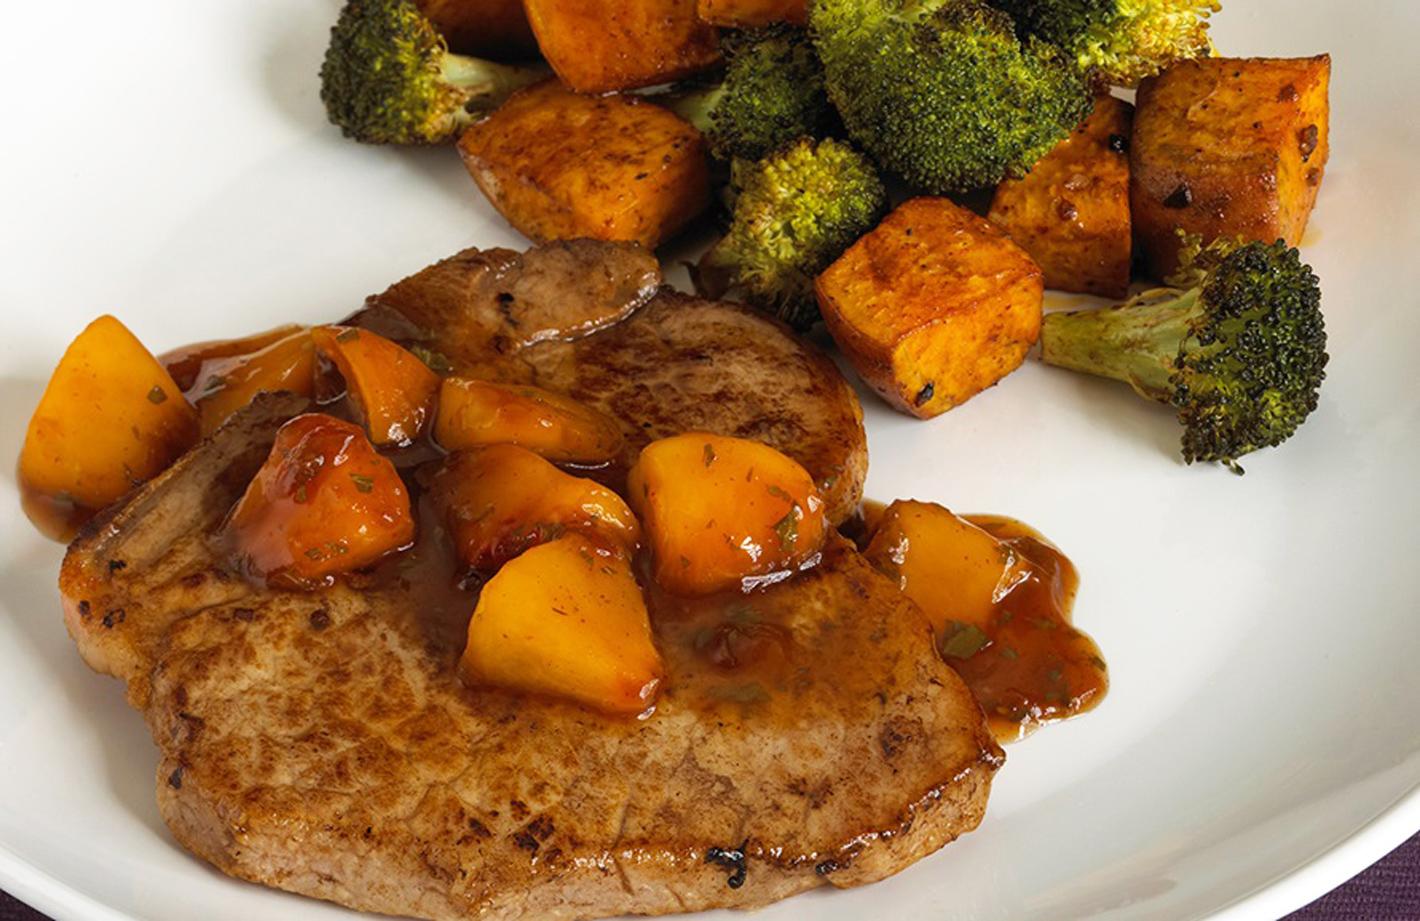 Pork Chops with Balsamic-Peach Glaze, Roasted Sweet Potatoes and Broccoli